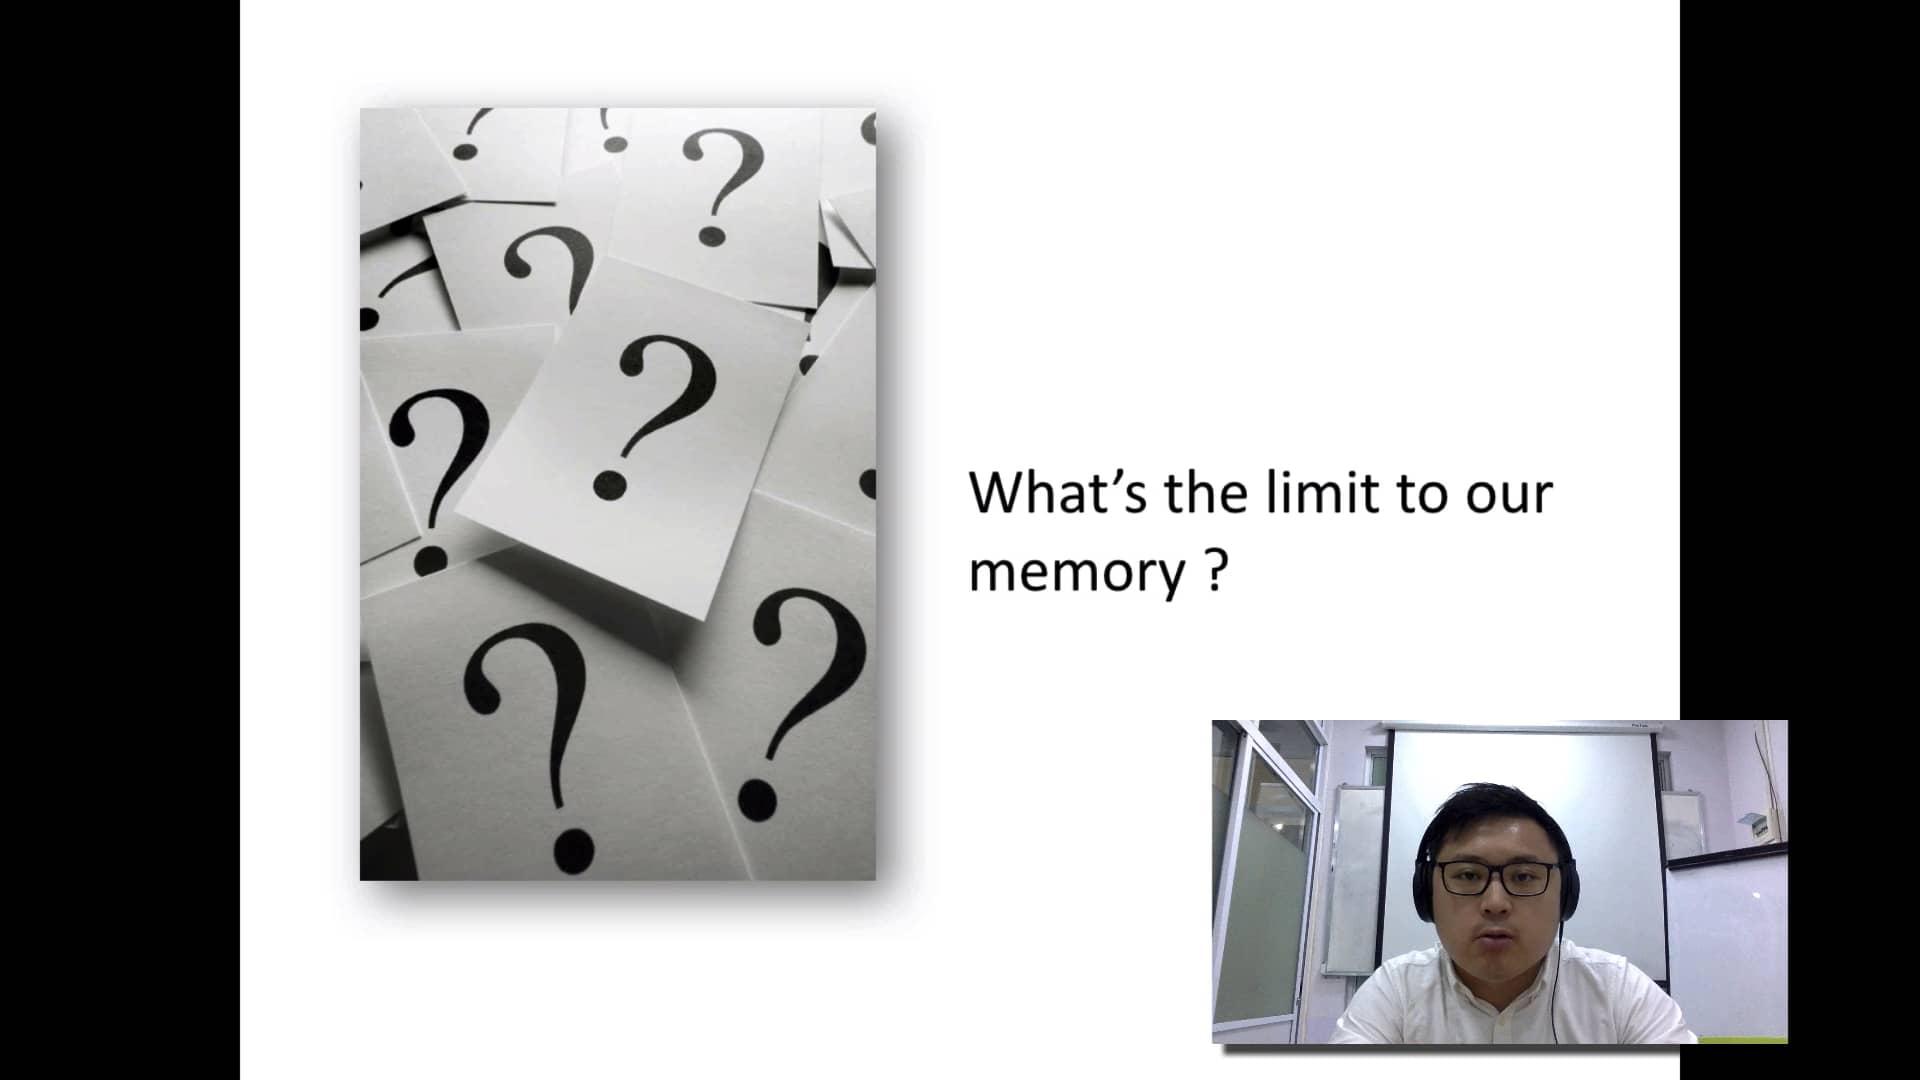 4. Limits of human memory